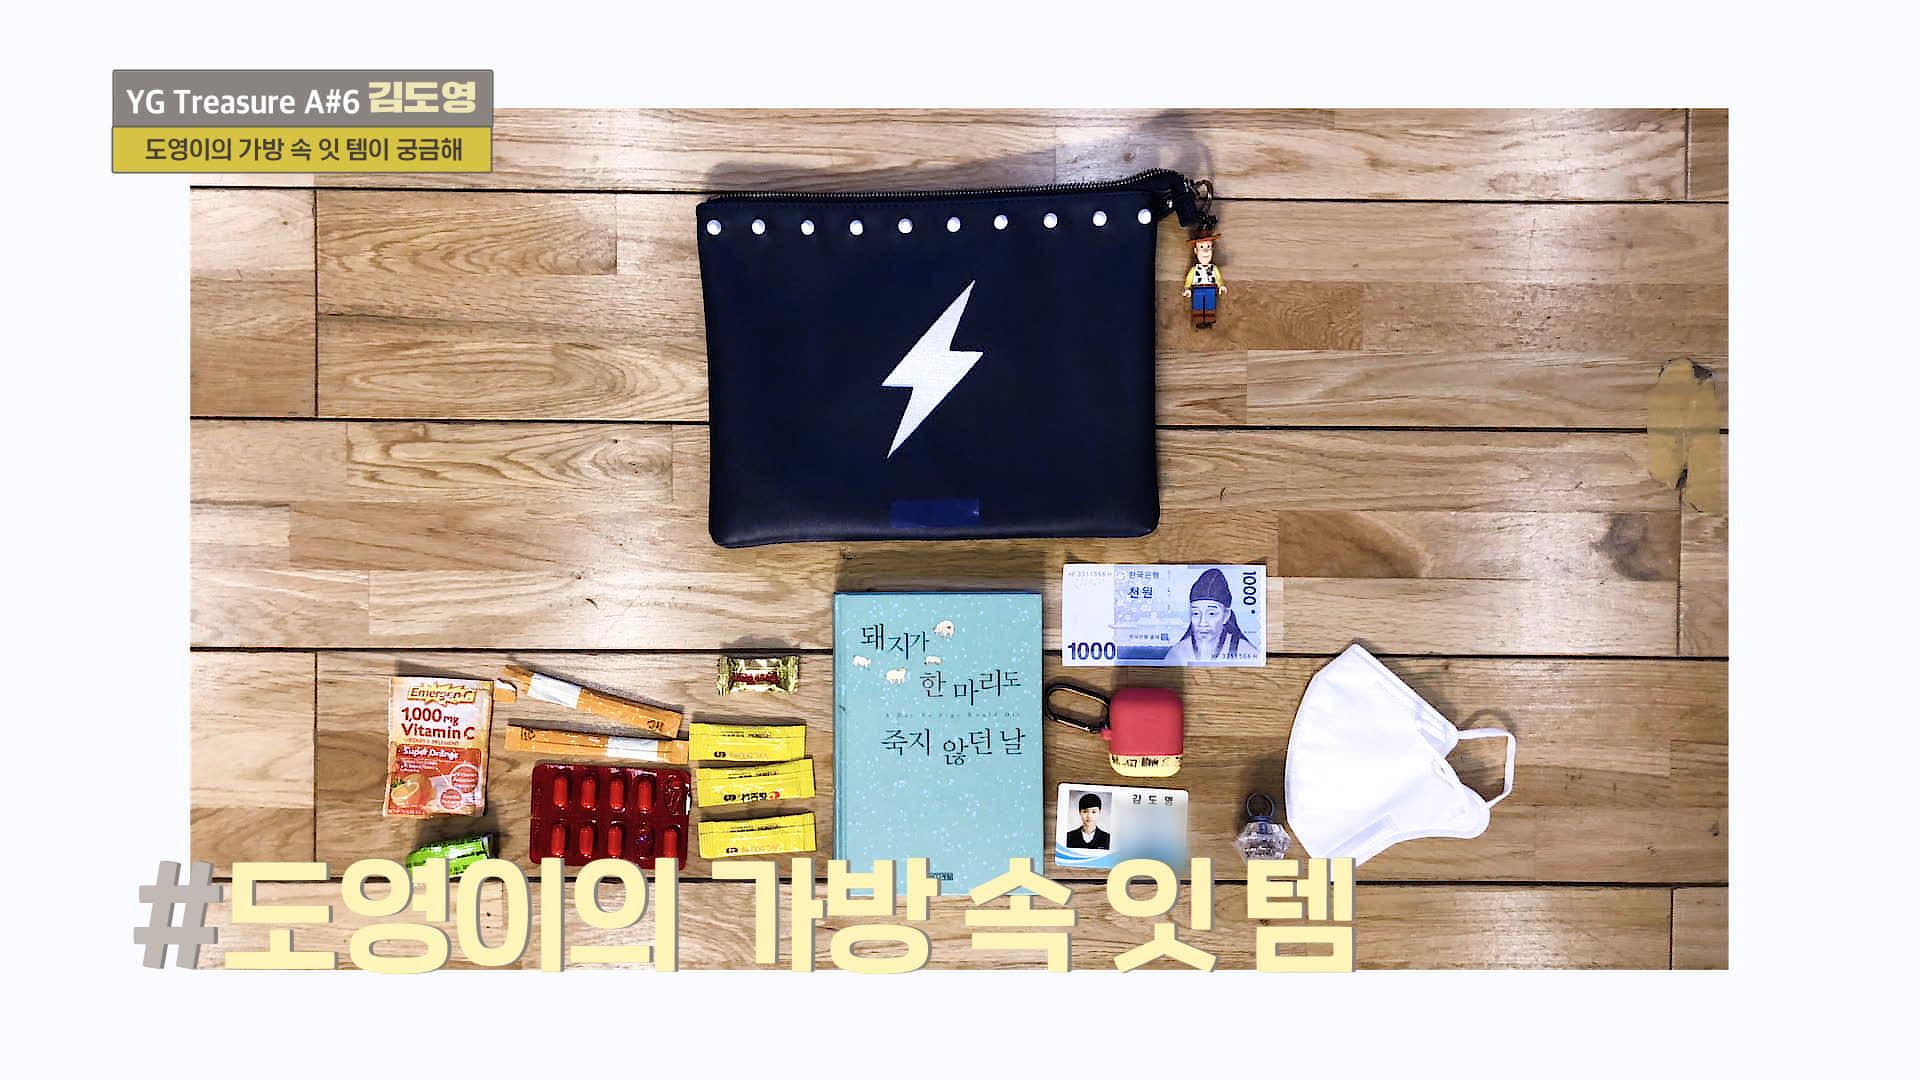 [IN MY BAG] 김도영 <KIM DOYOUNG> l YG보석함